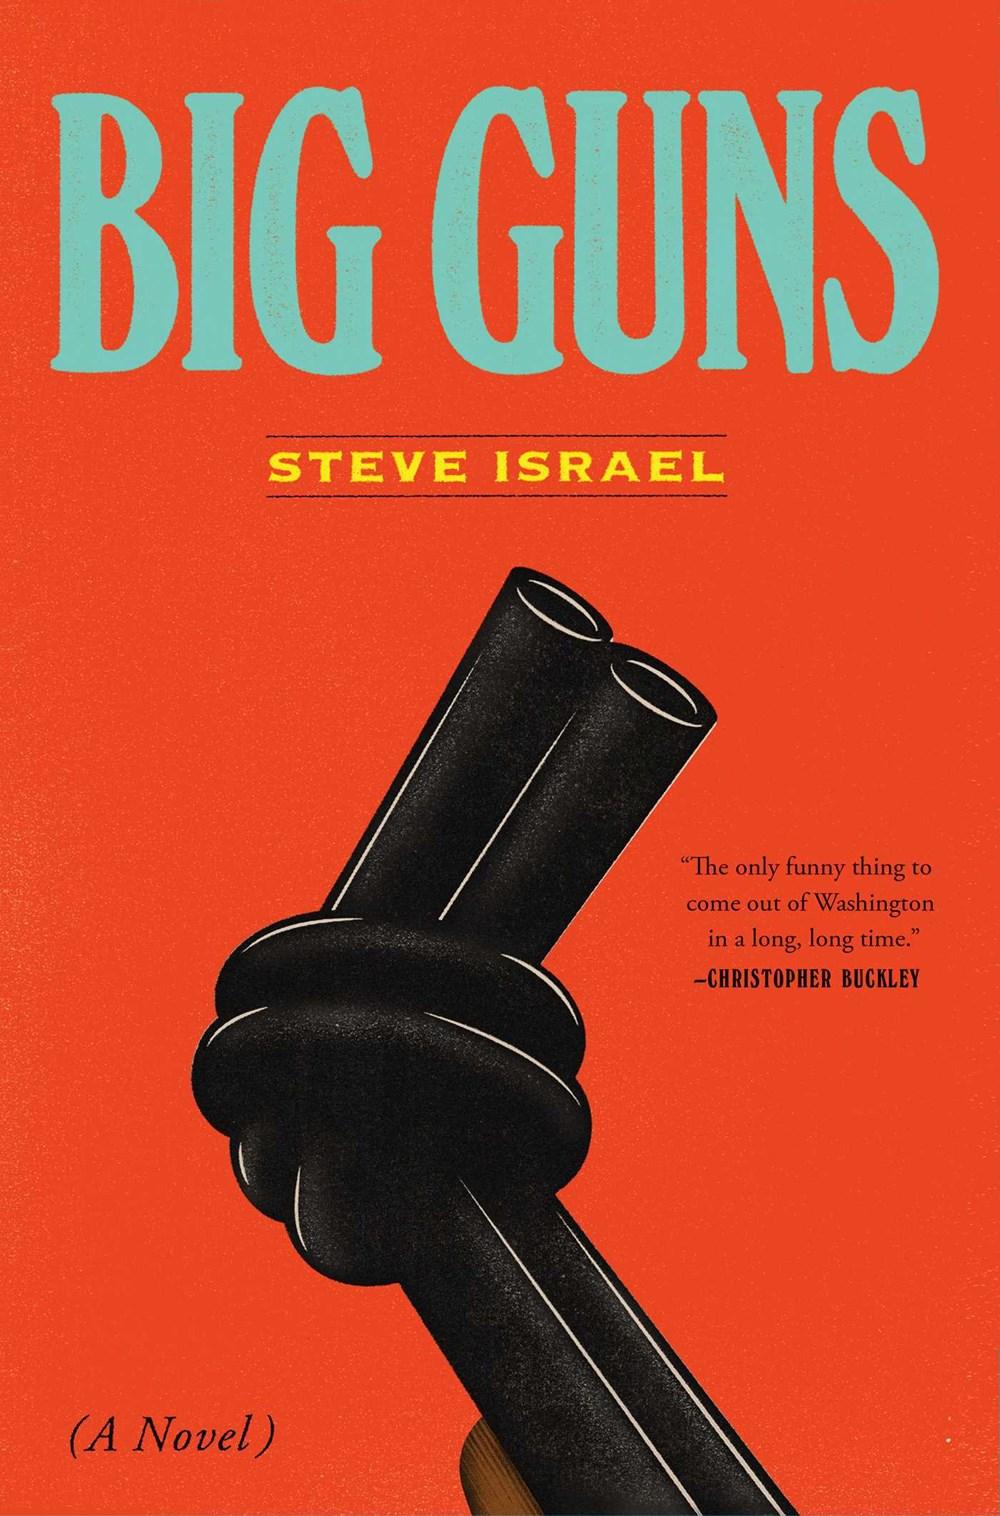 bigguns.jpg